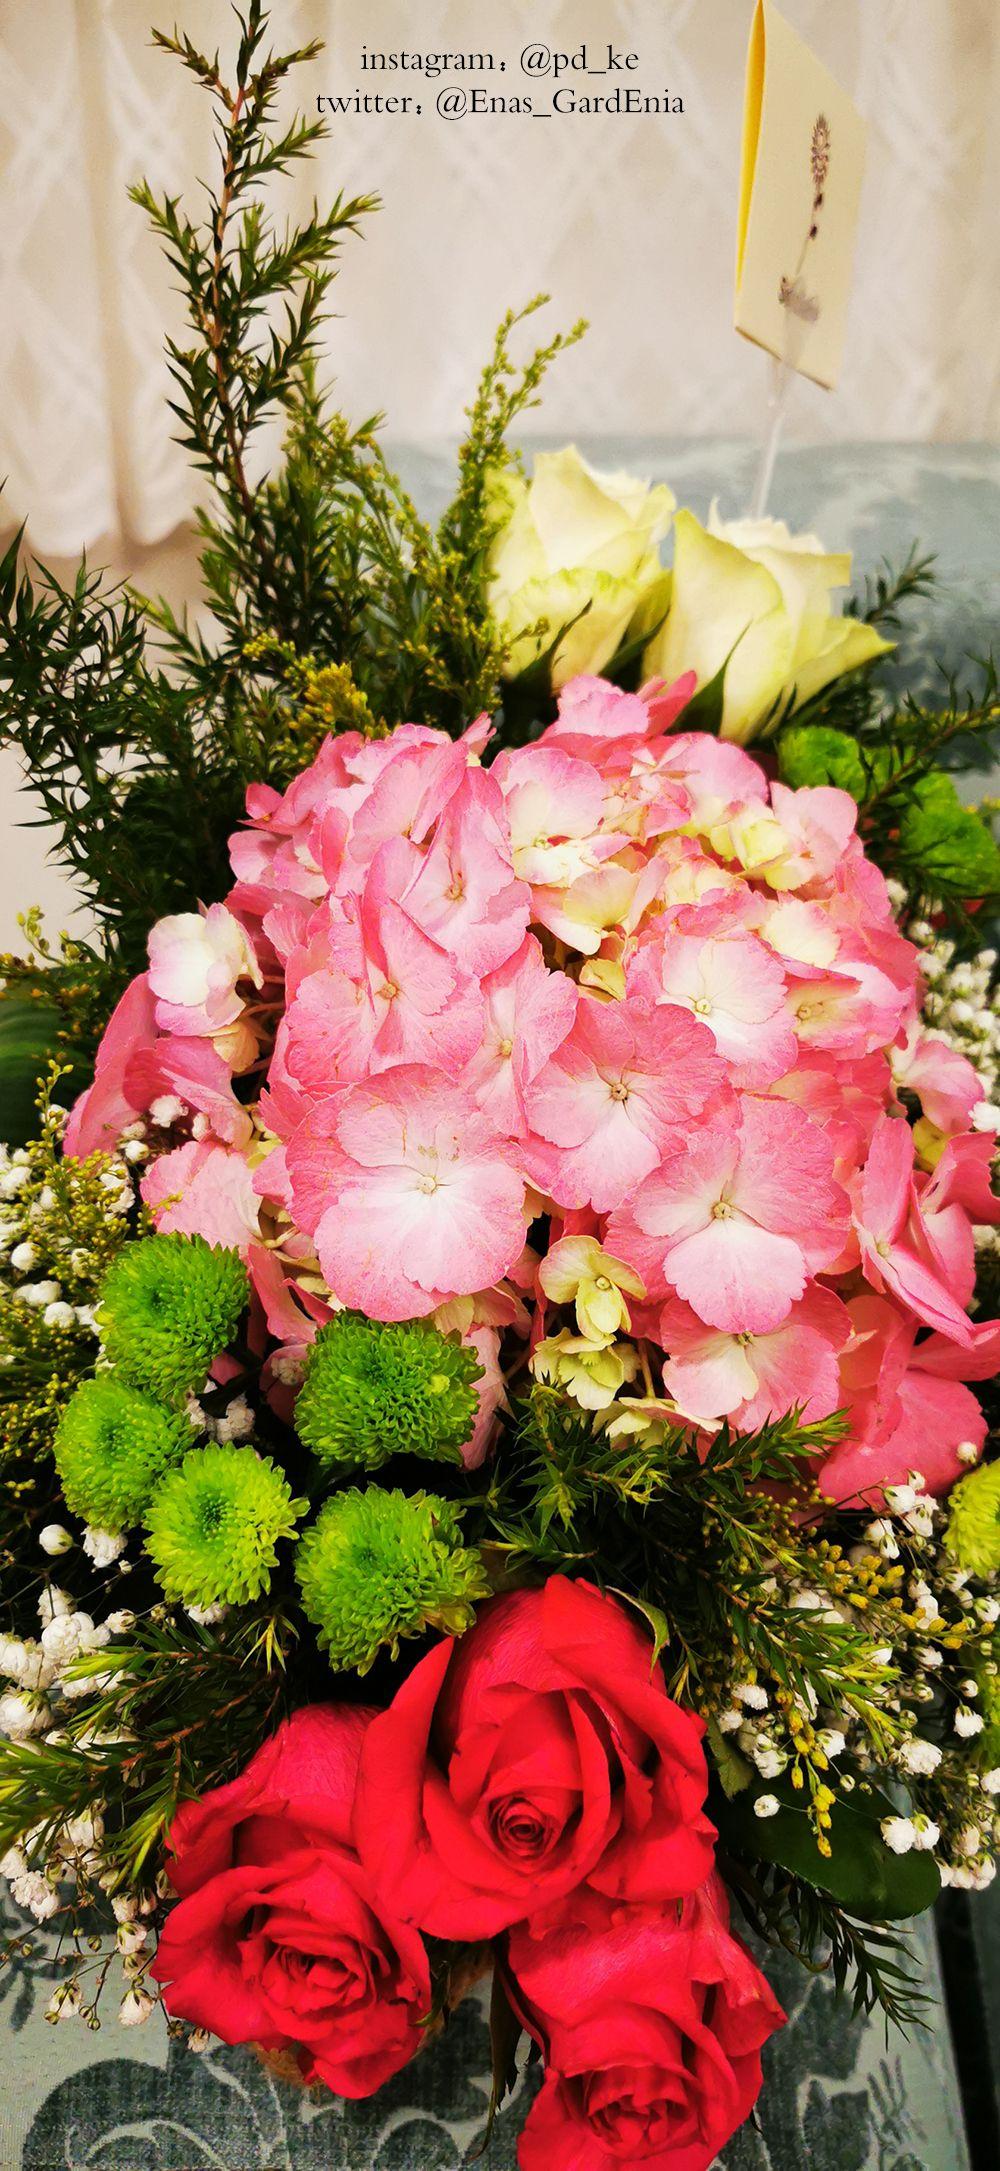 Snapchat Enasart Www Instagram Com Pd Ke تصويري ايناس الغاردينيا تصوير جوال تصوير السعودية جدة بني مالك الجنوب جنوب In 2020 Floral Wreath Floral Wreaths